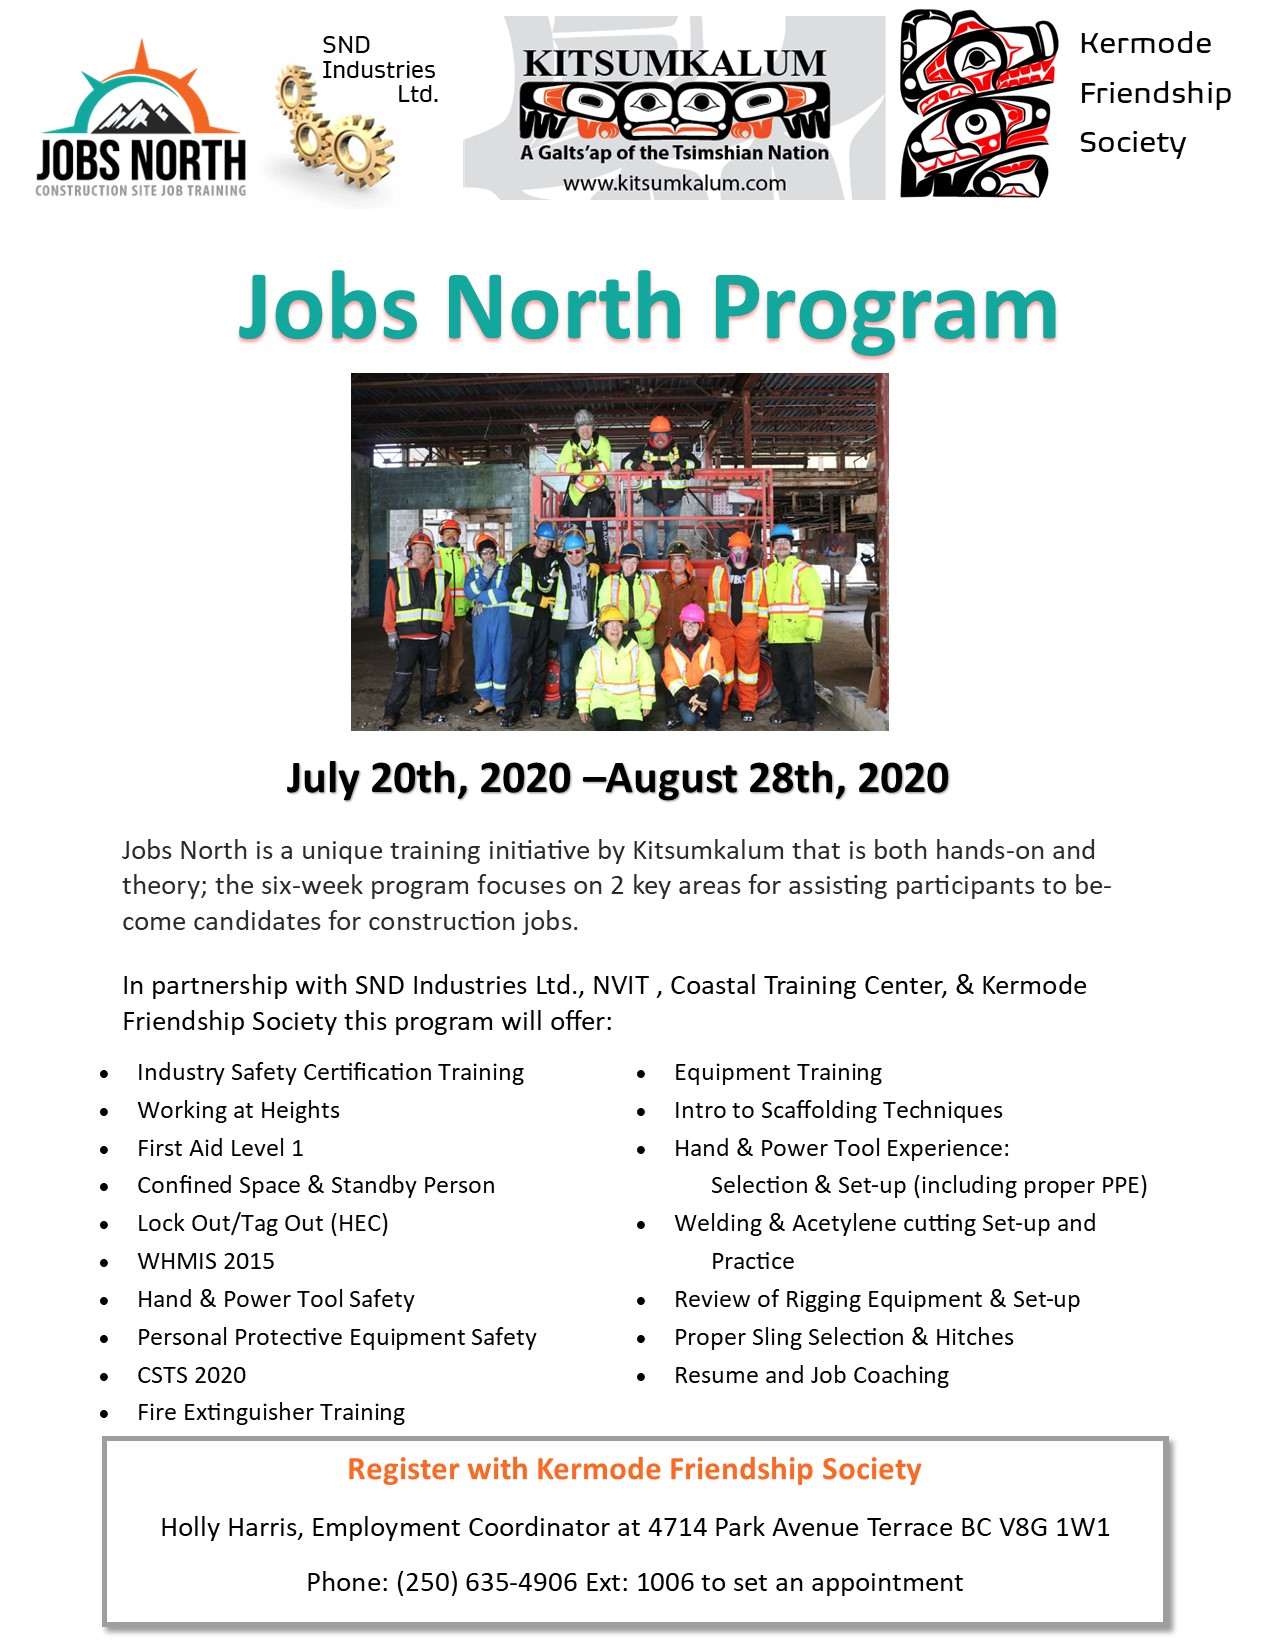 Jobs North – Construction Training Initiative